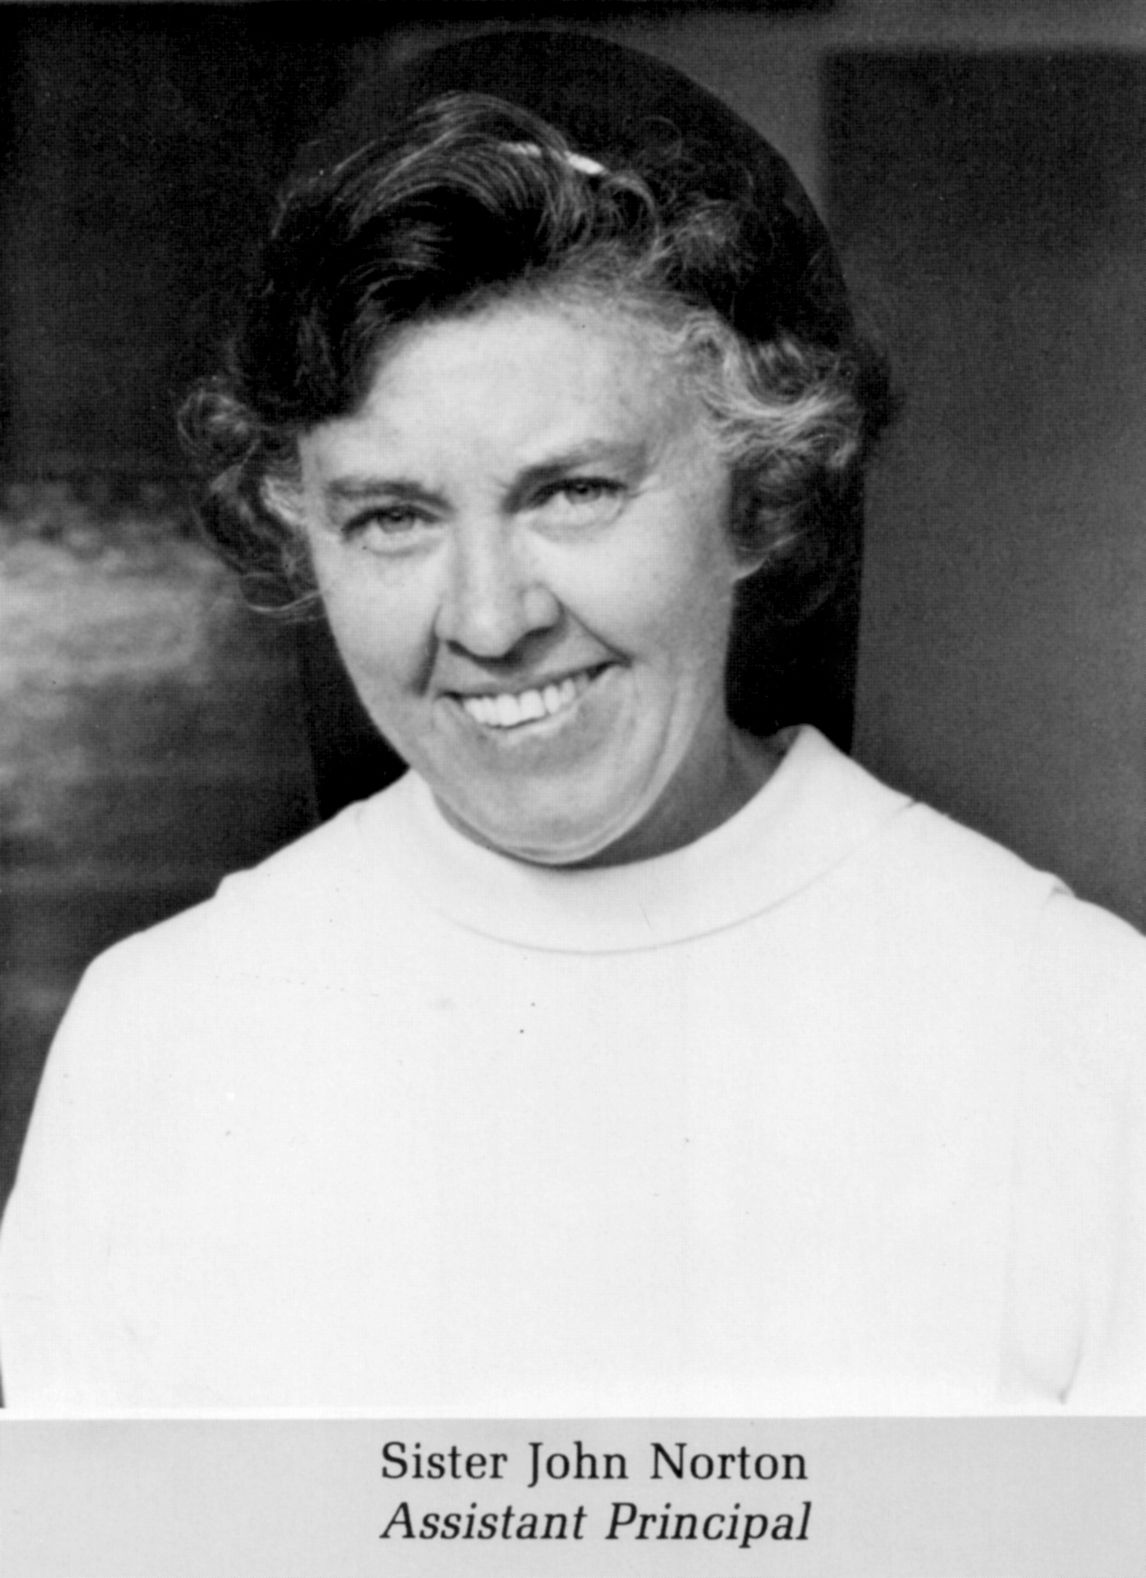 1972 Sister John Norton